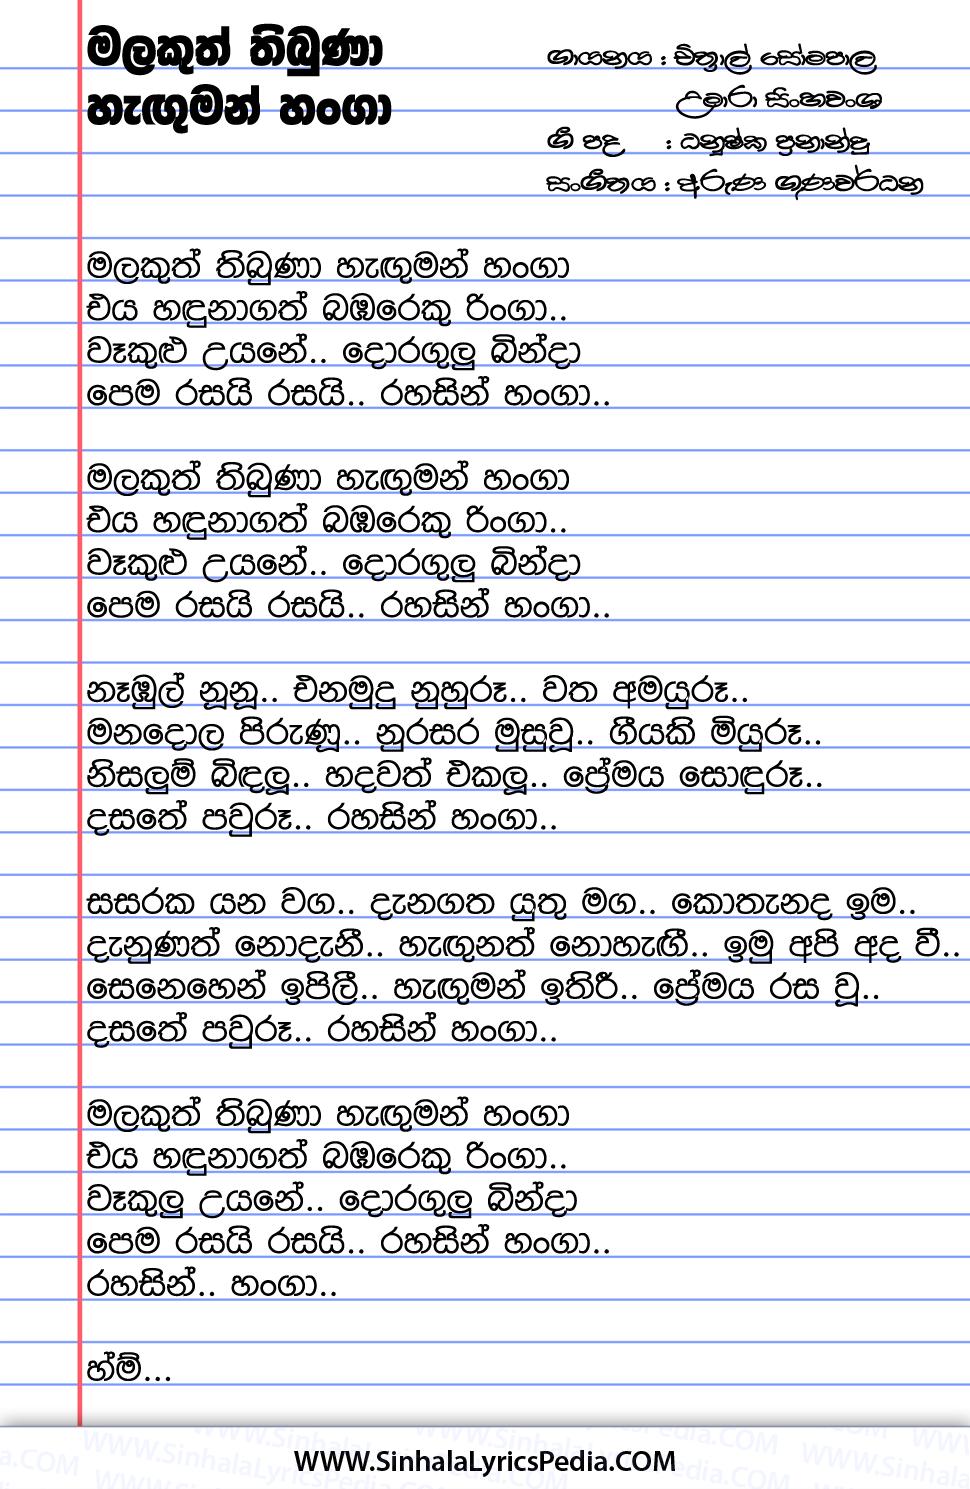 Malakuth Thibuna Haguman Hanga Song Lyrics